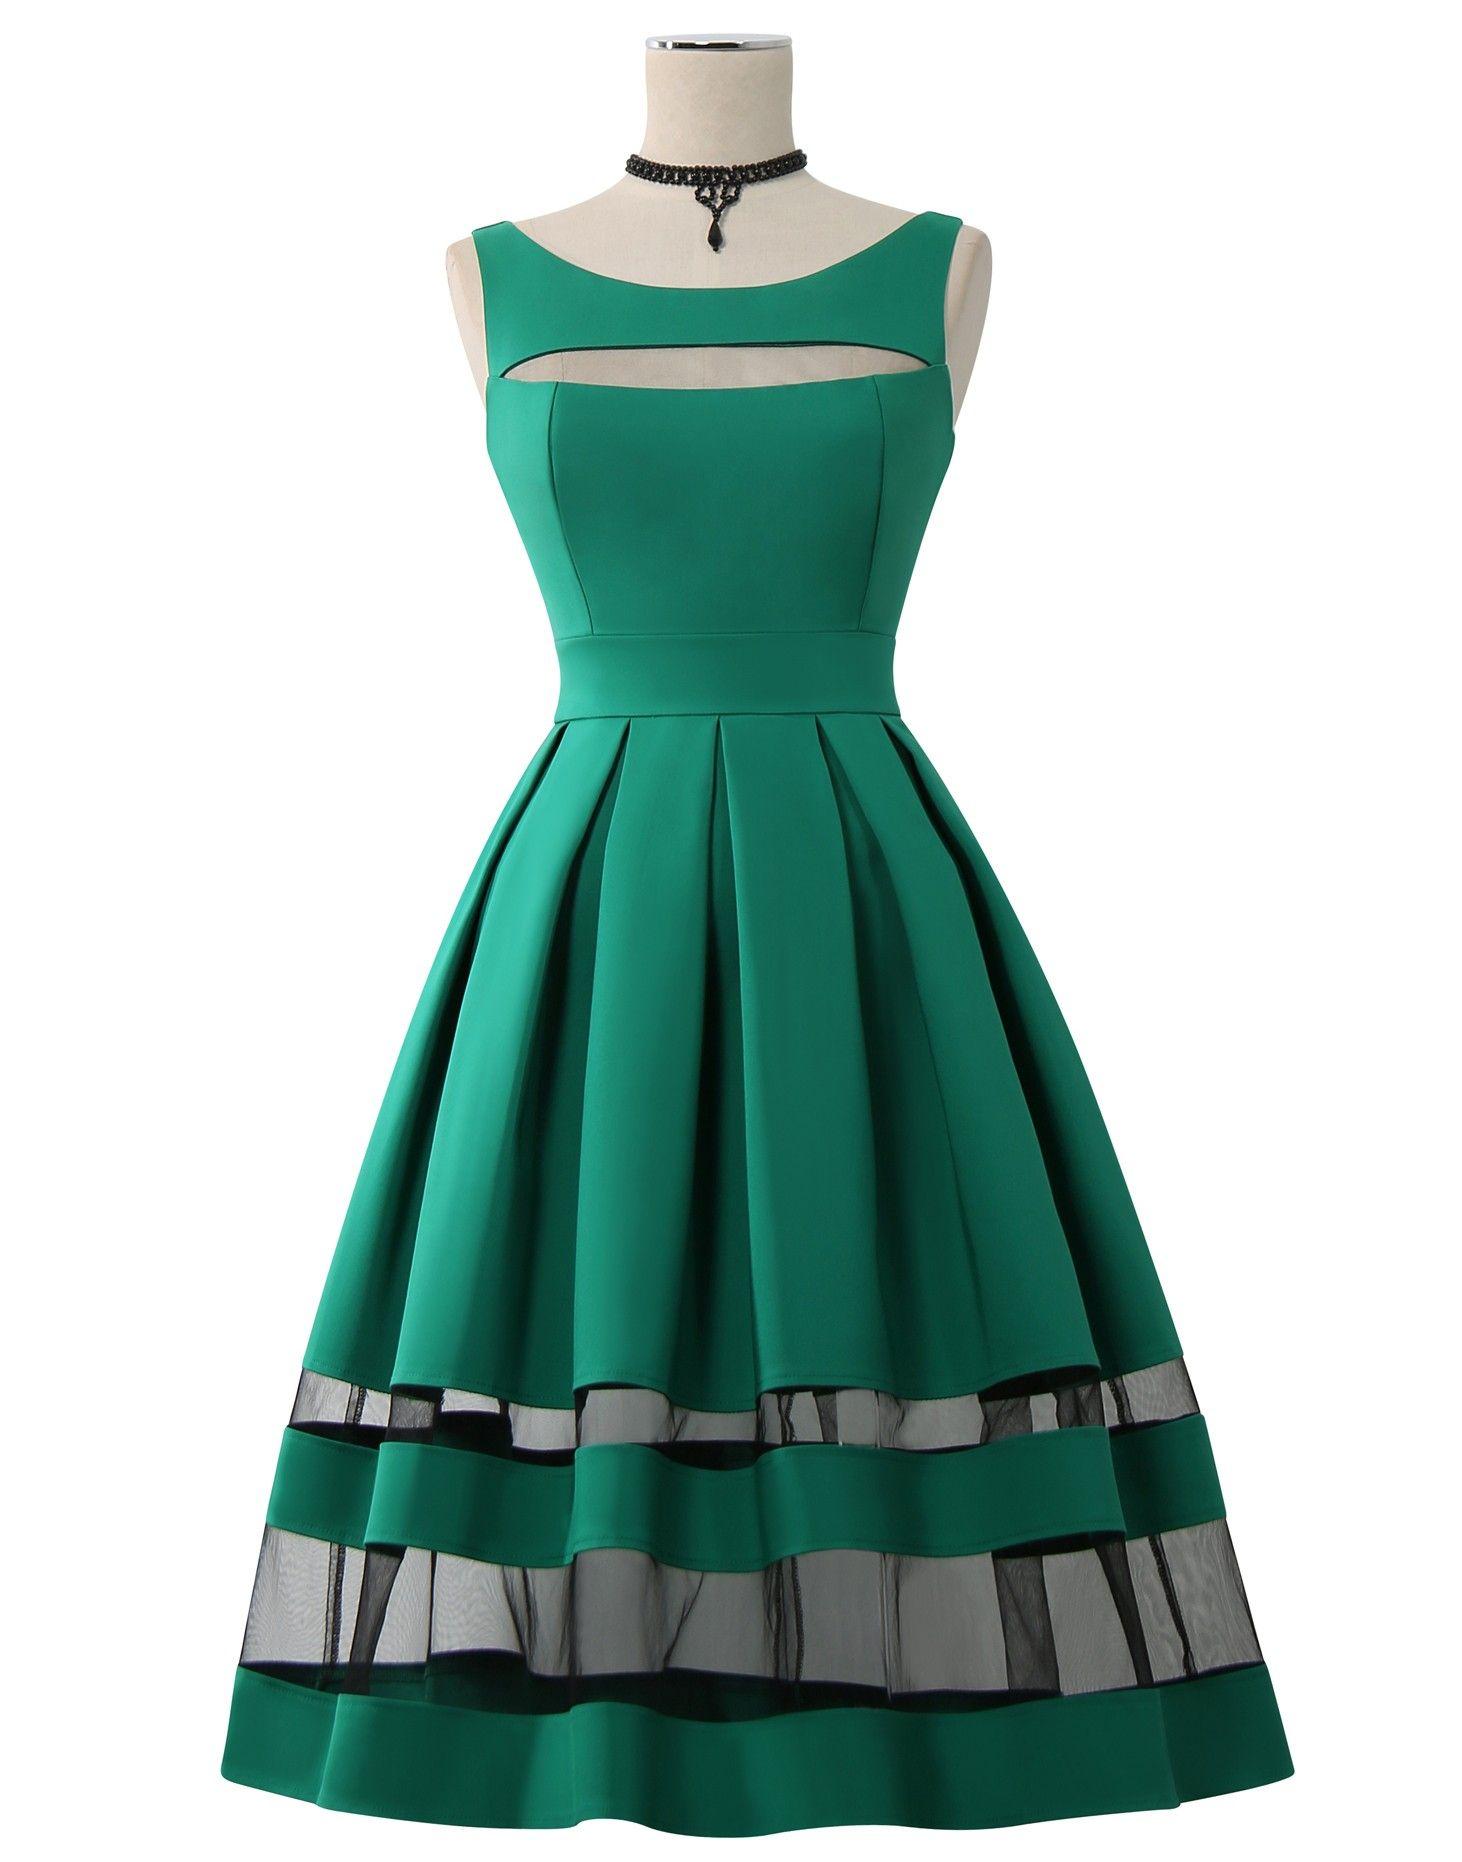 Pin by Shannon Sescoe on Green Envy ☘☘☘ | Pinterest | Panel dress ...